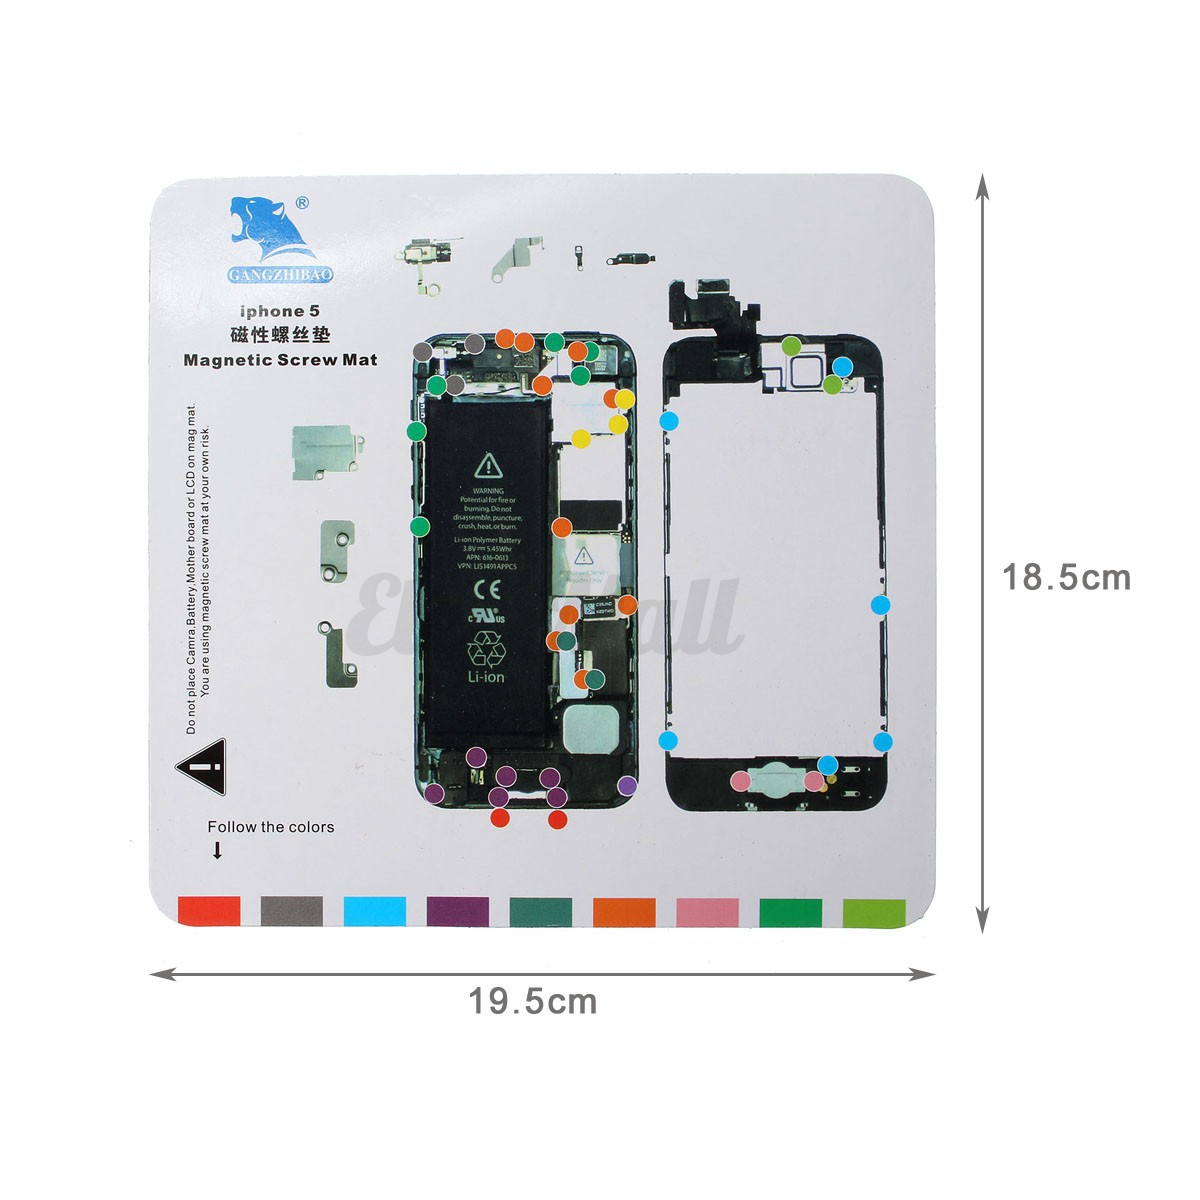 Iphone  Screw Size Chart